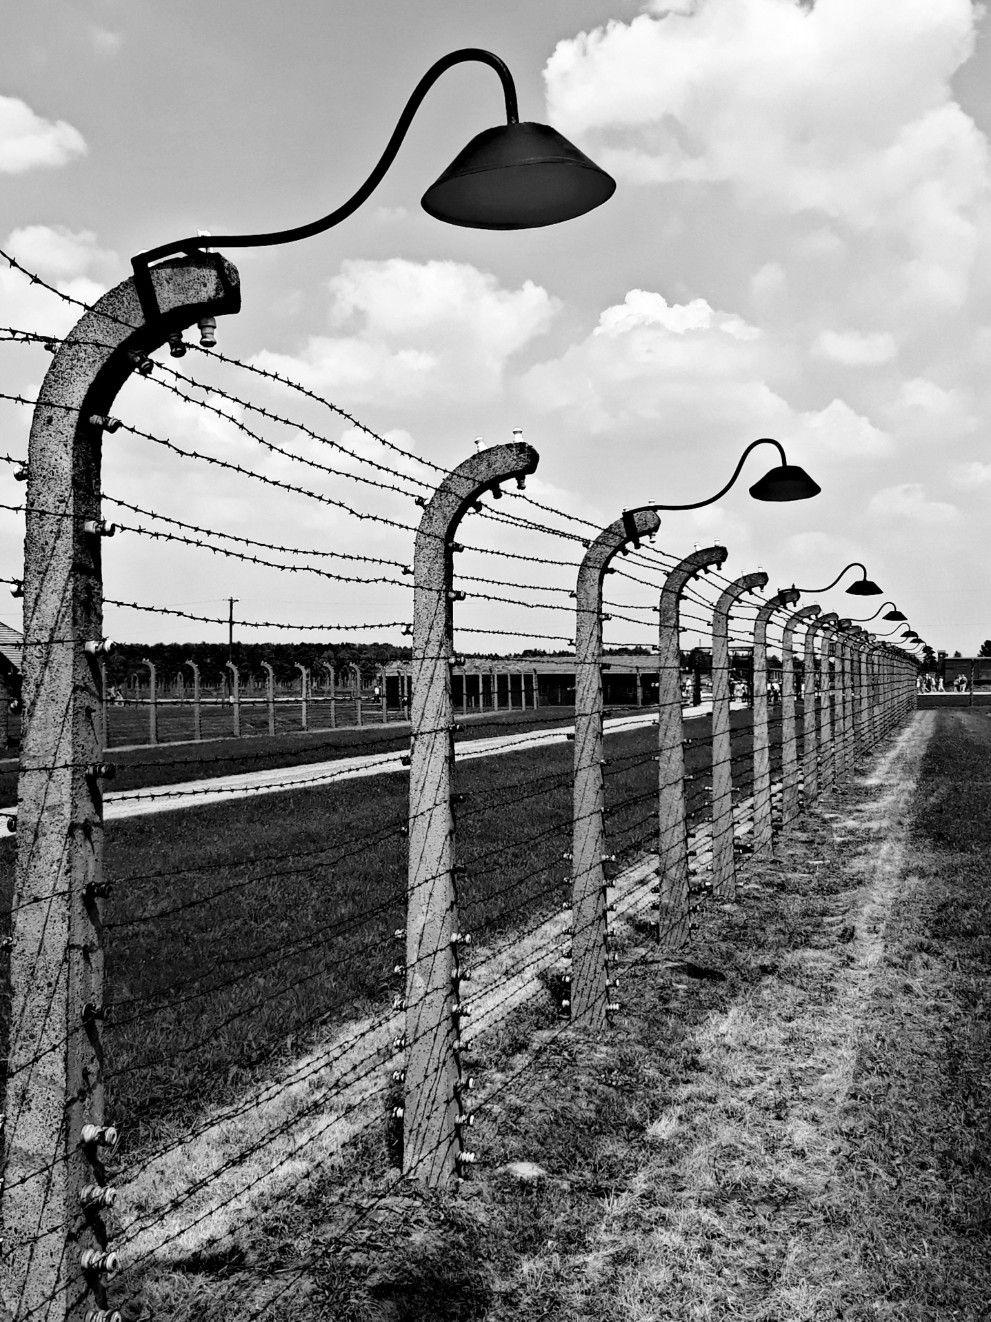 Pin Op Auschwitz Birkenau Poland By Ruben Draijer